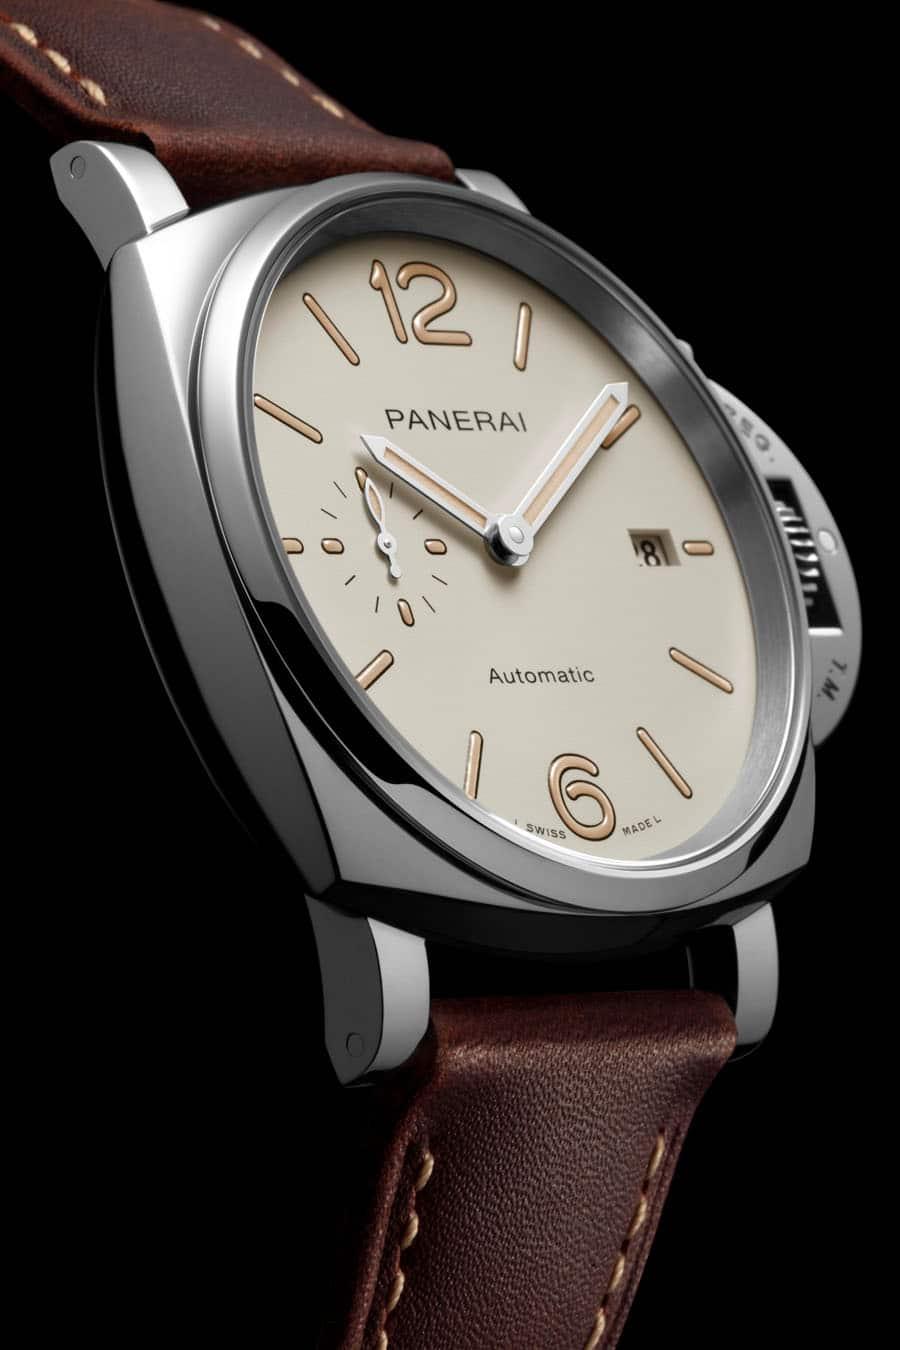 Panerai: Luminor Due PAM01046 mit beigefarbenem Zifferblatt